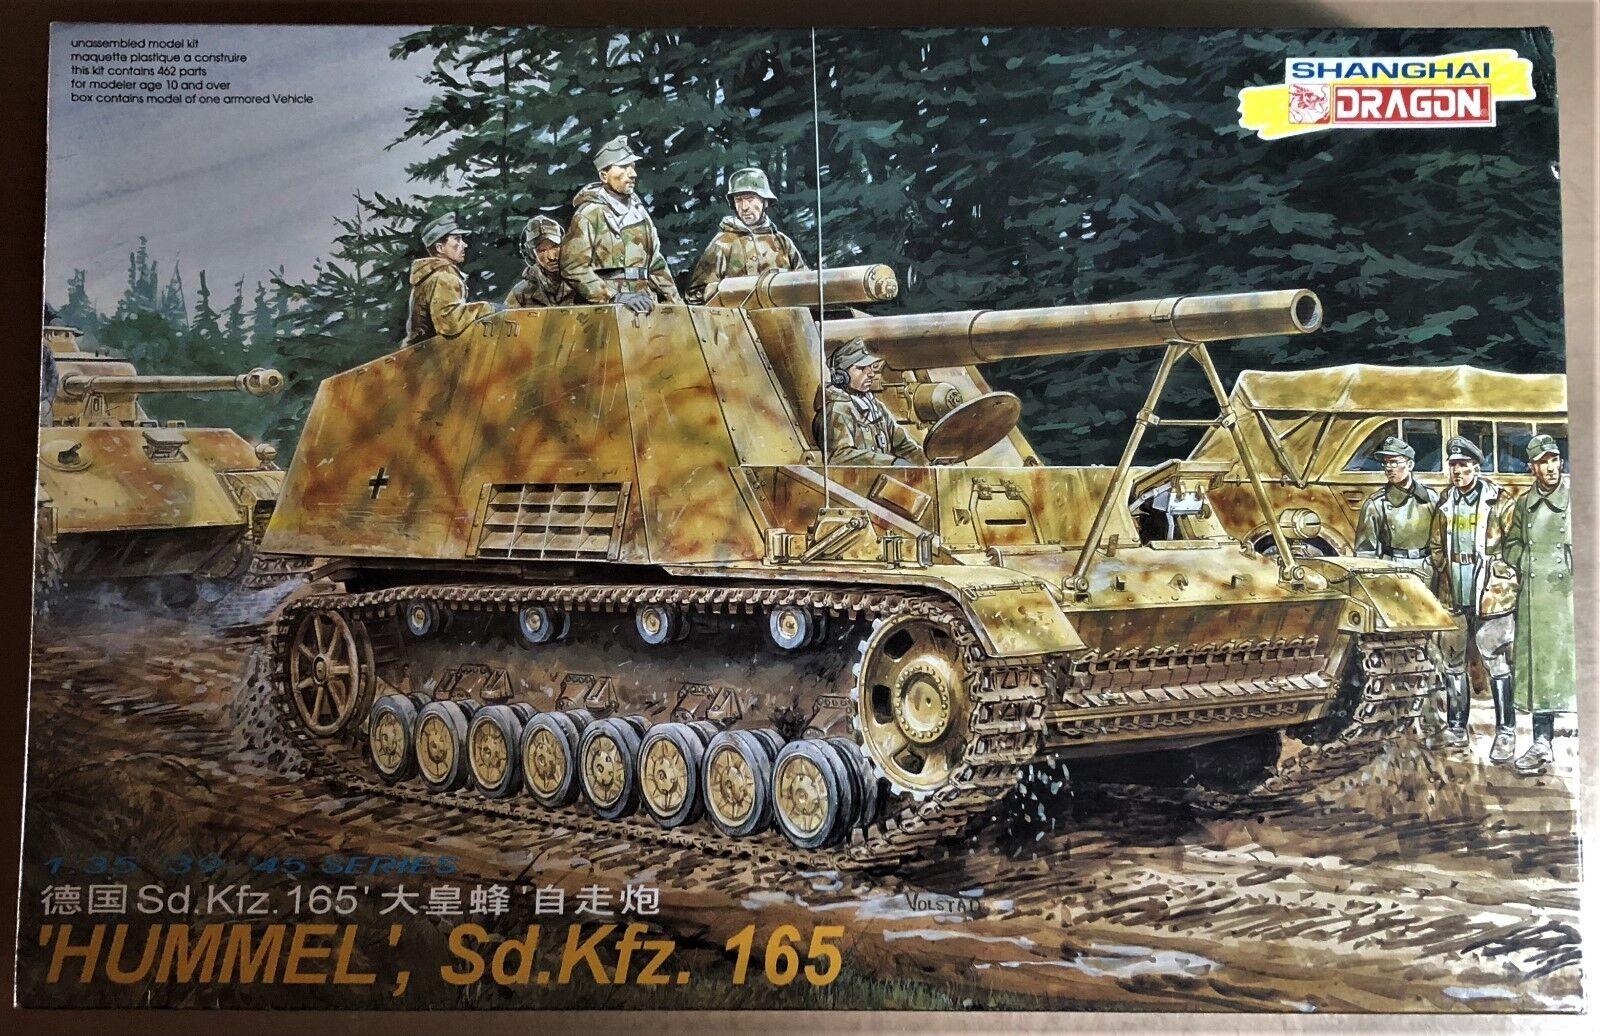 DRAGON 6004 - 'HUMMEL' Sd.Kfz. 165 - 1 35 PLASTIC KIT